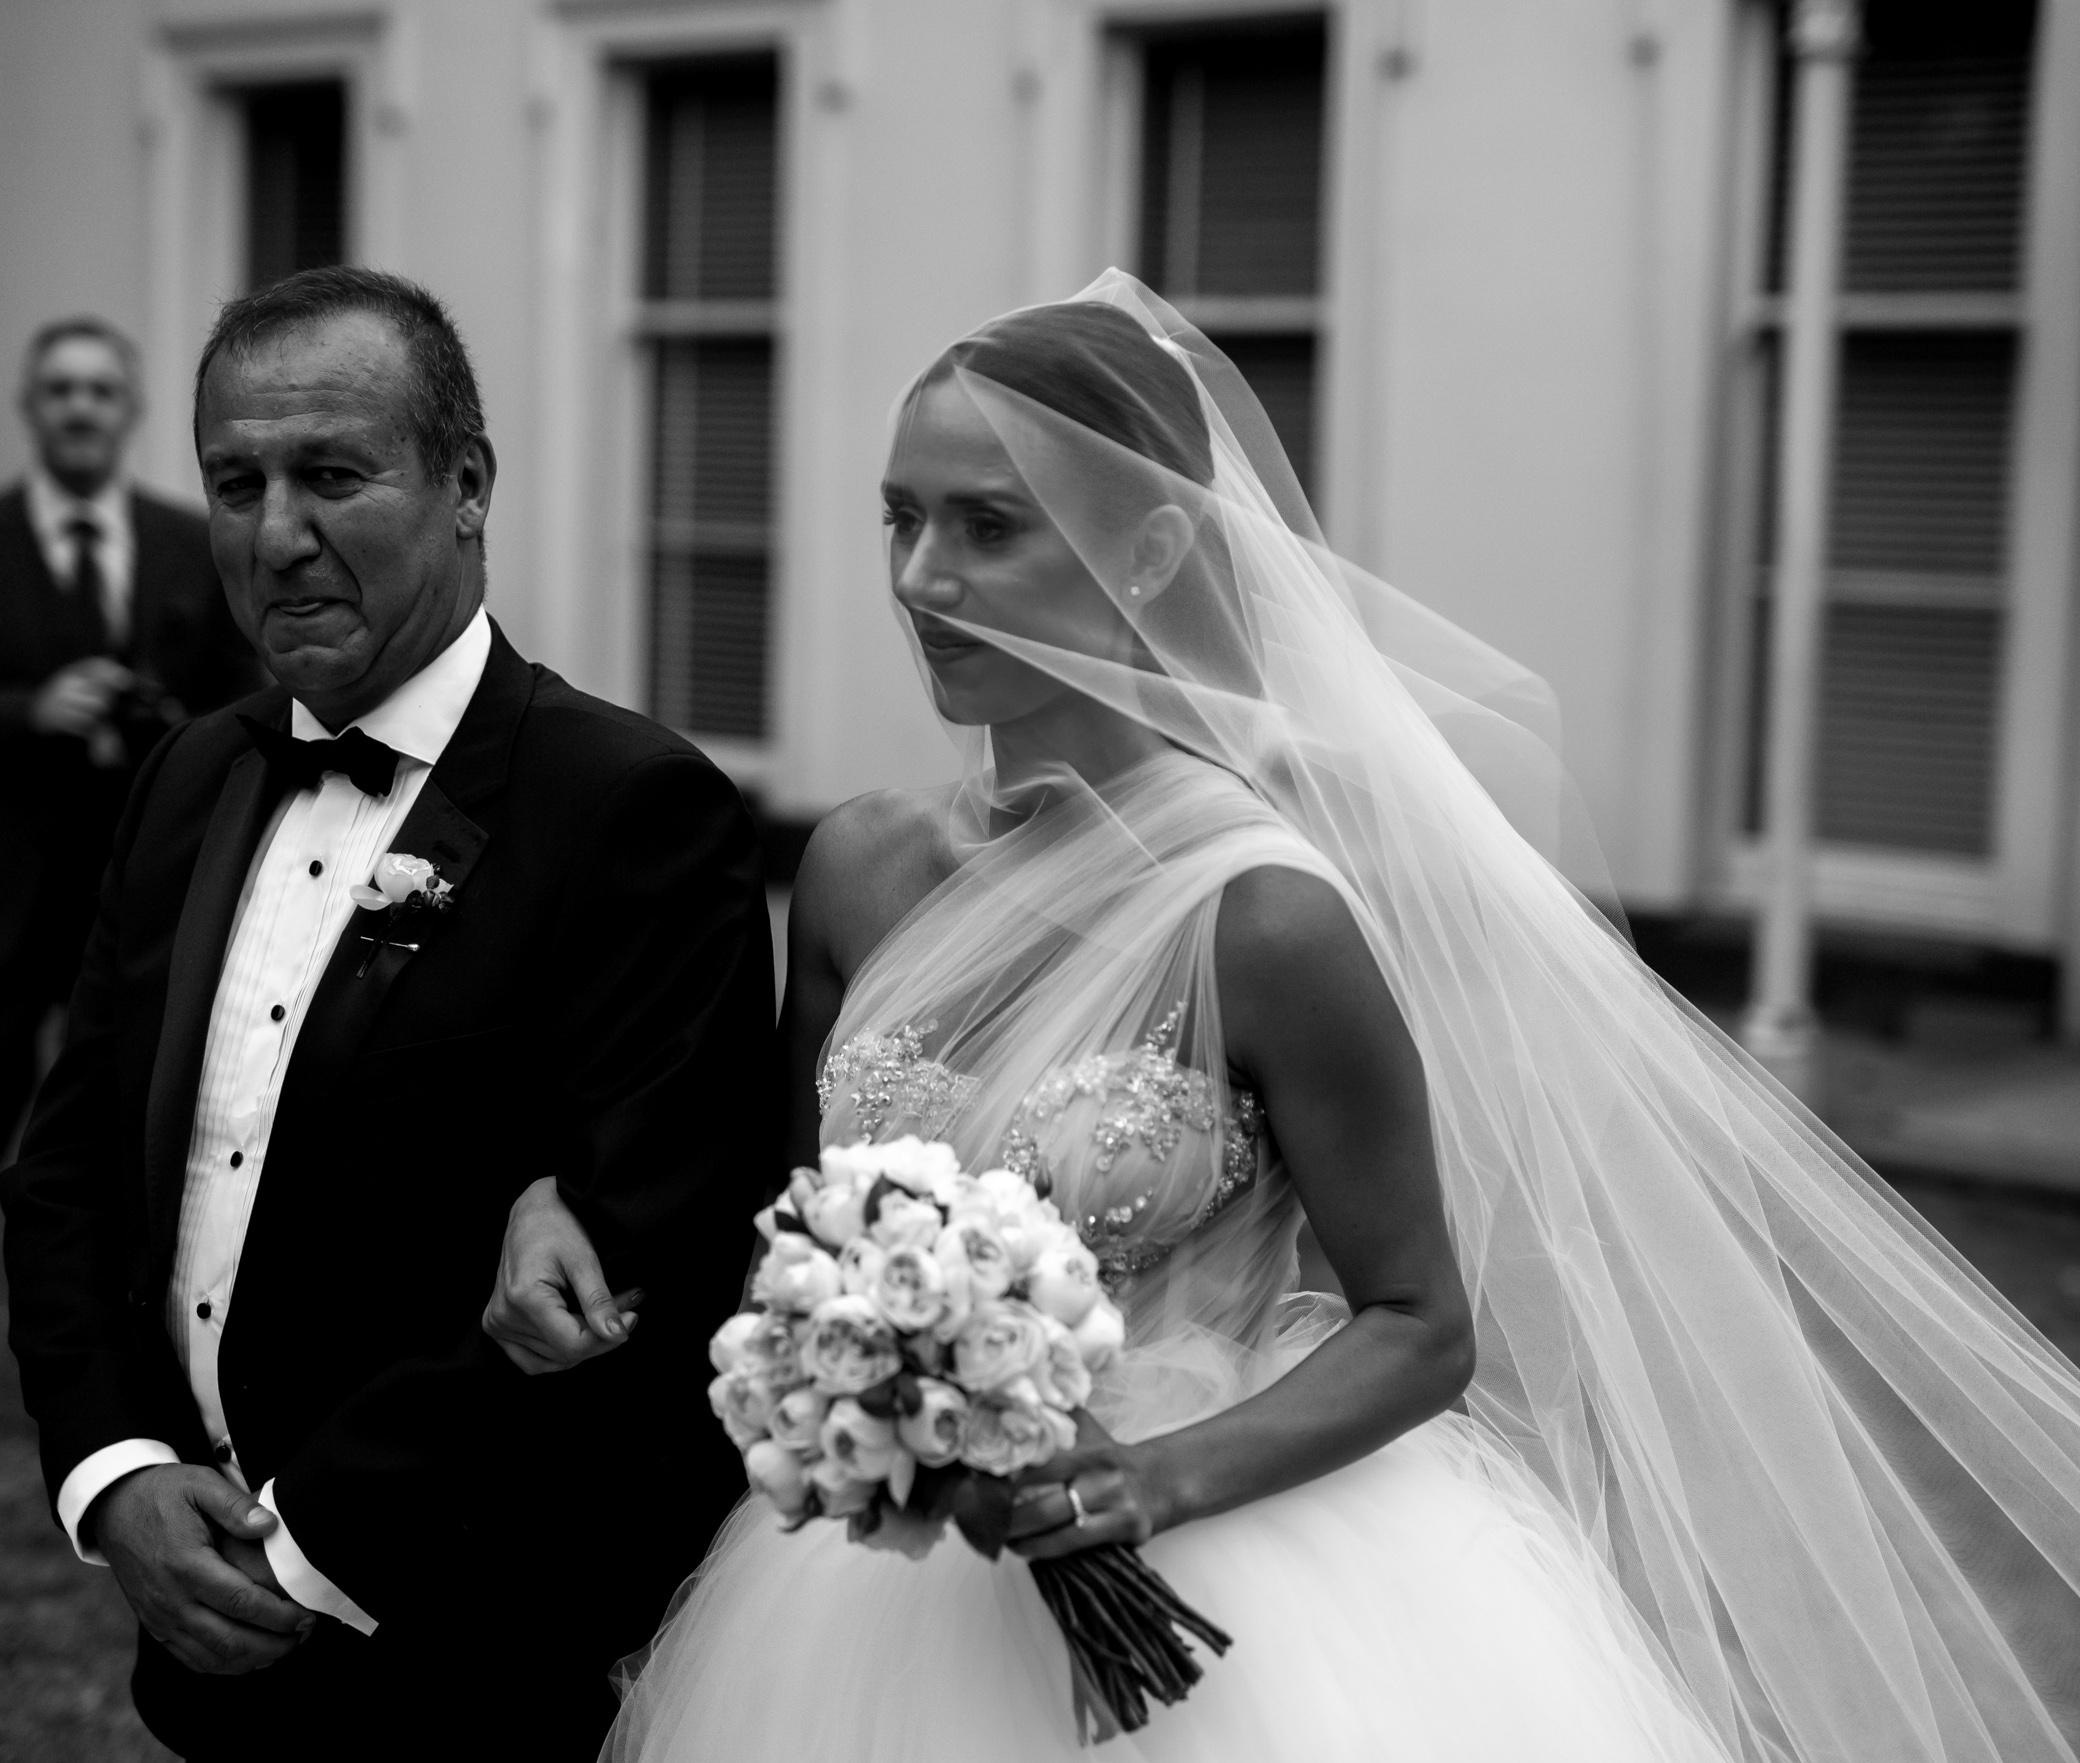 mr-theodore_white-vine-photography_same-sex-wedding-directory11.jpg